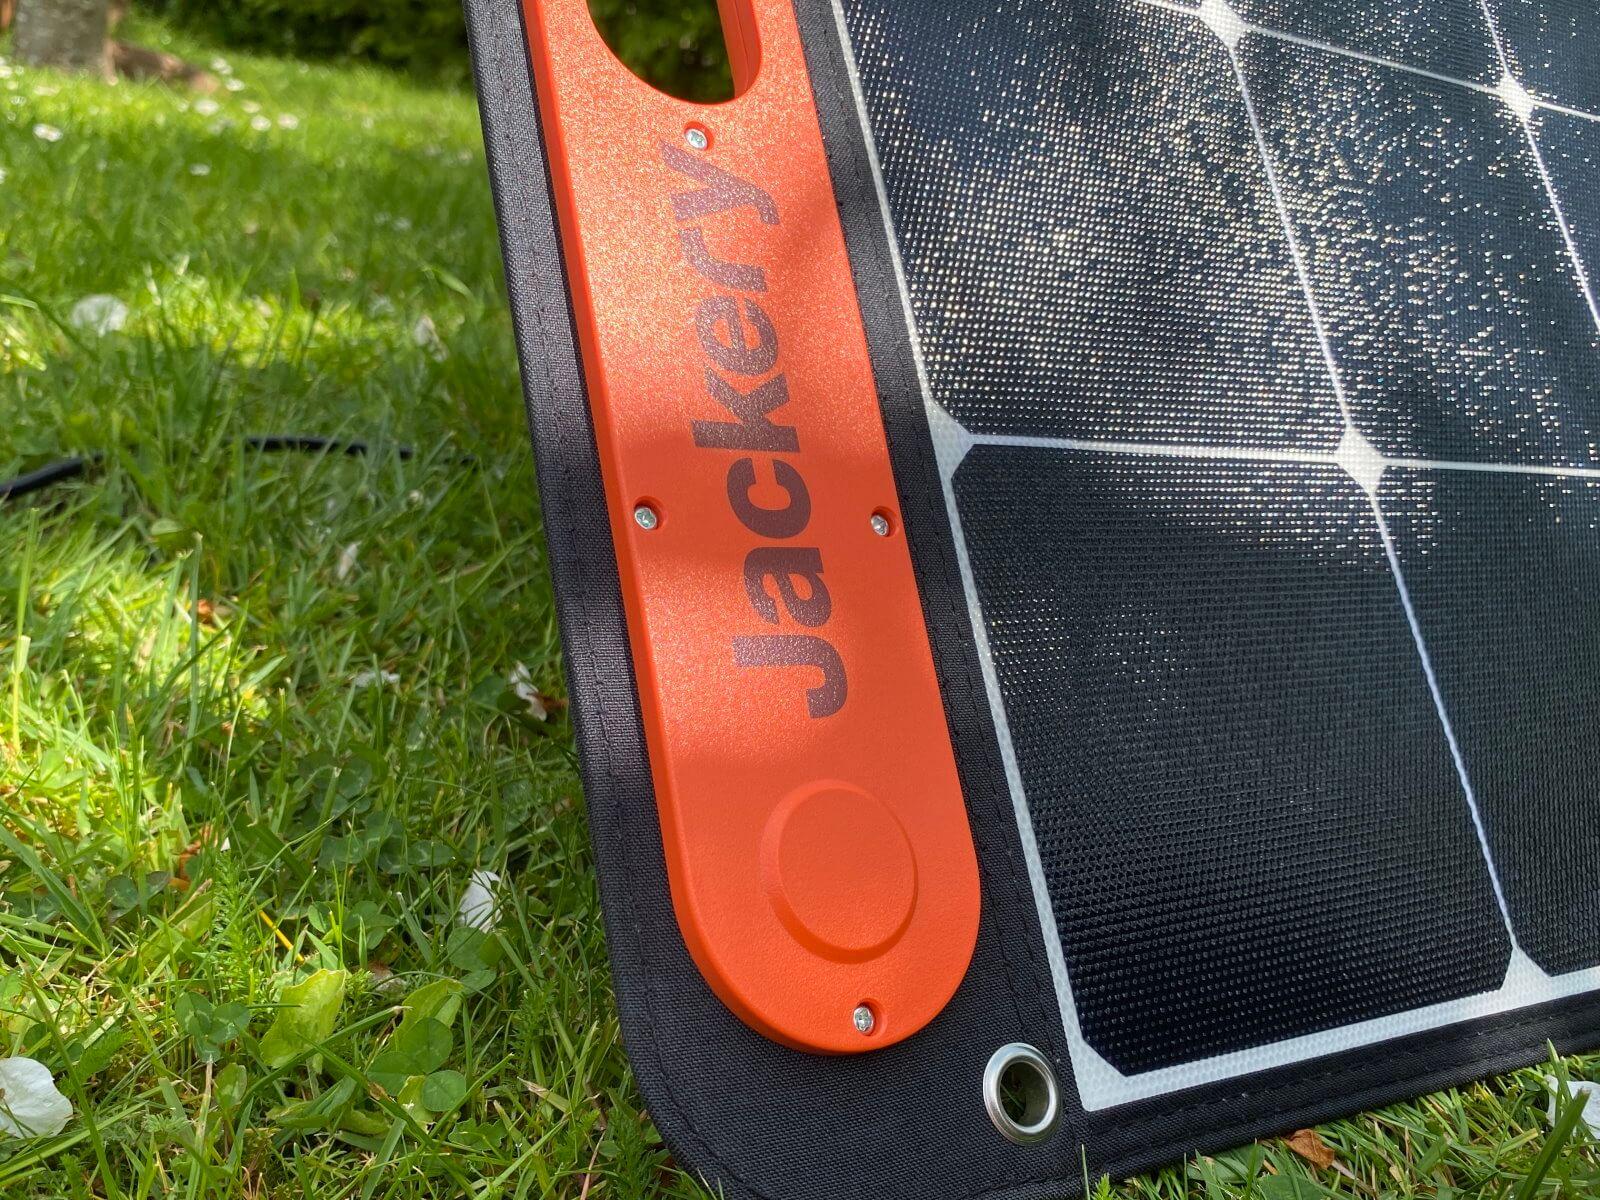 Jackery SolarSaga 100W Solar Panel Test - Titelbild